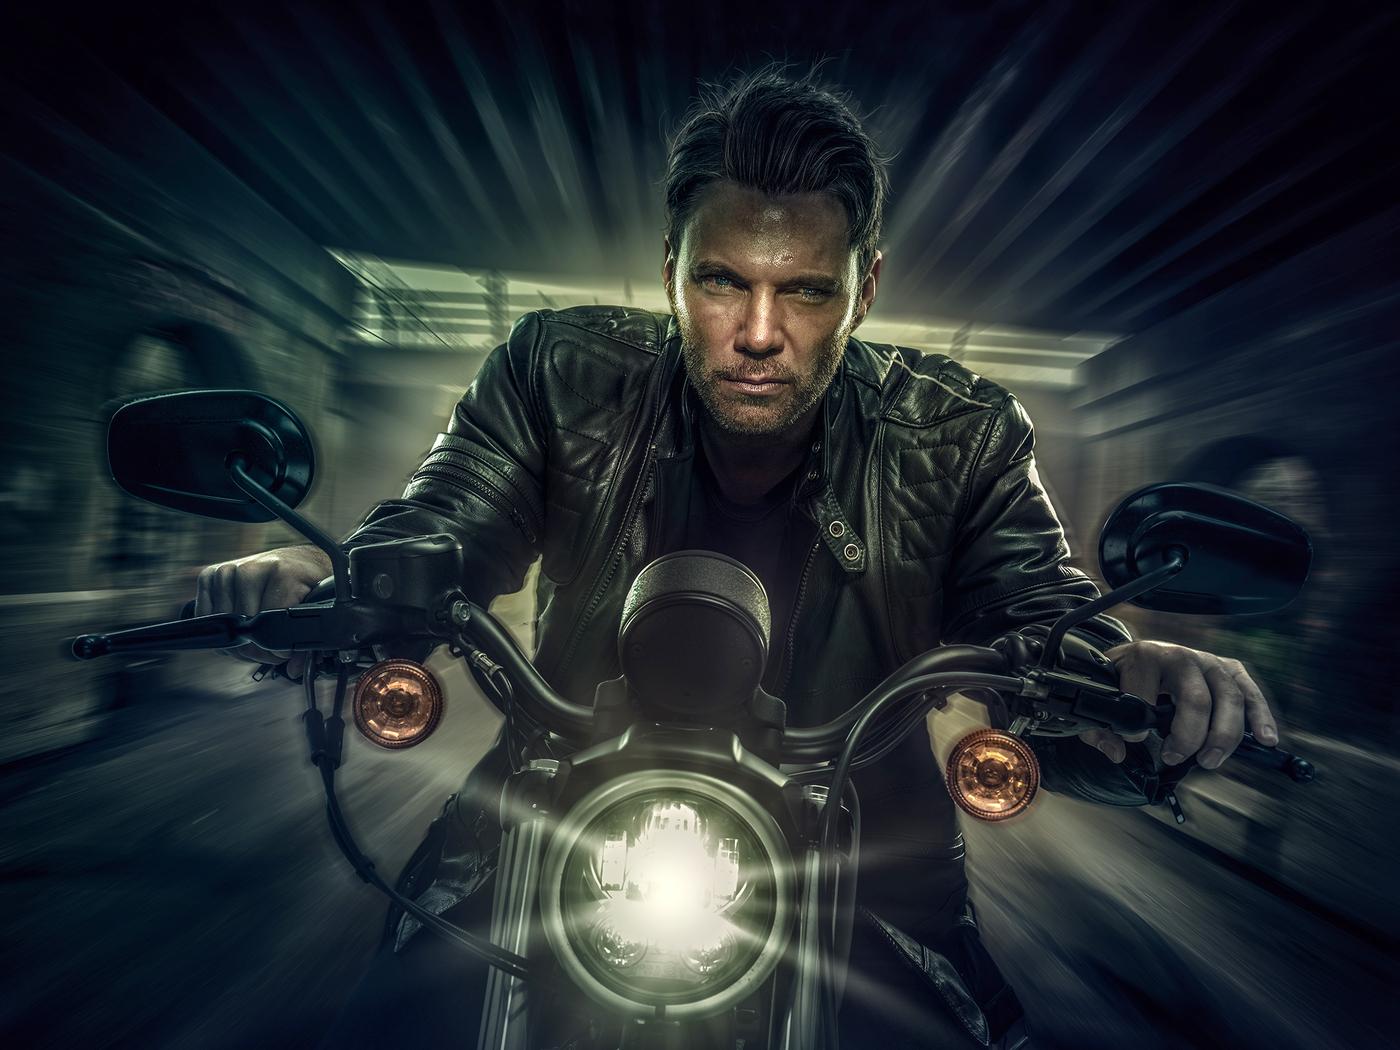 harley-davidson-bike-night-rider-l0.jpg